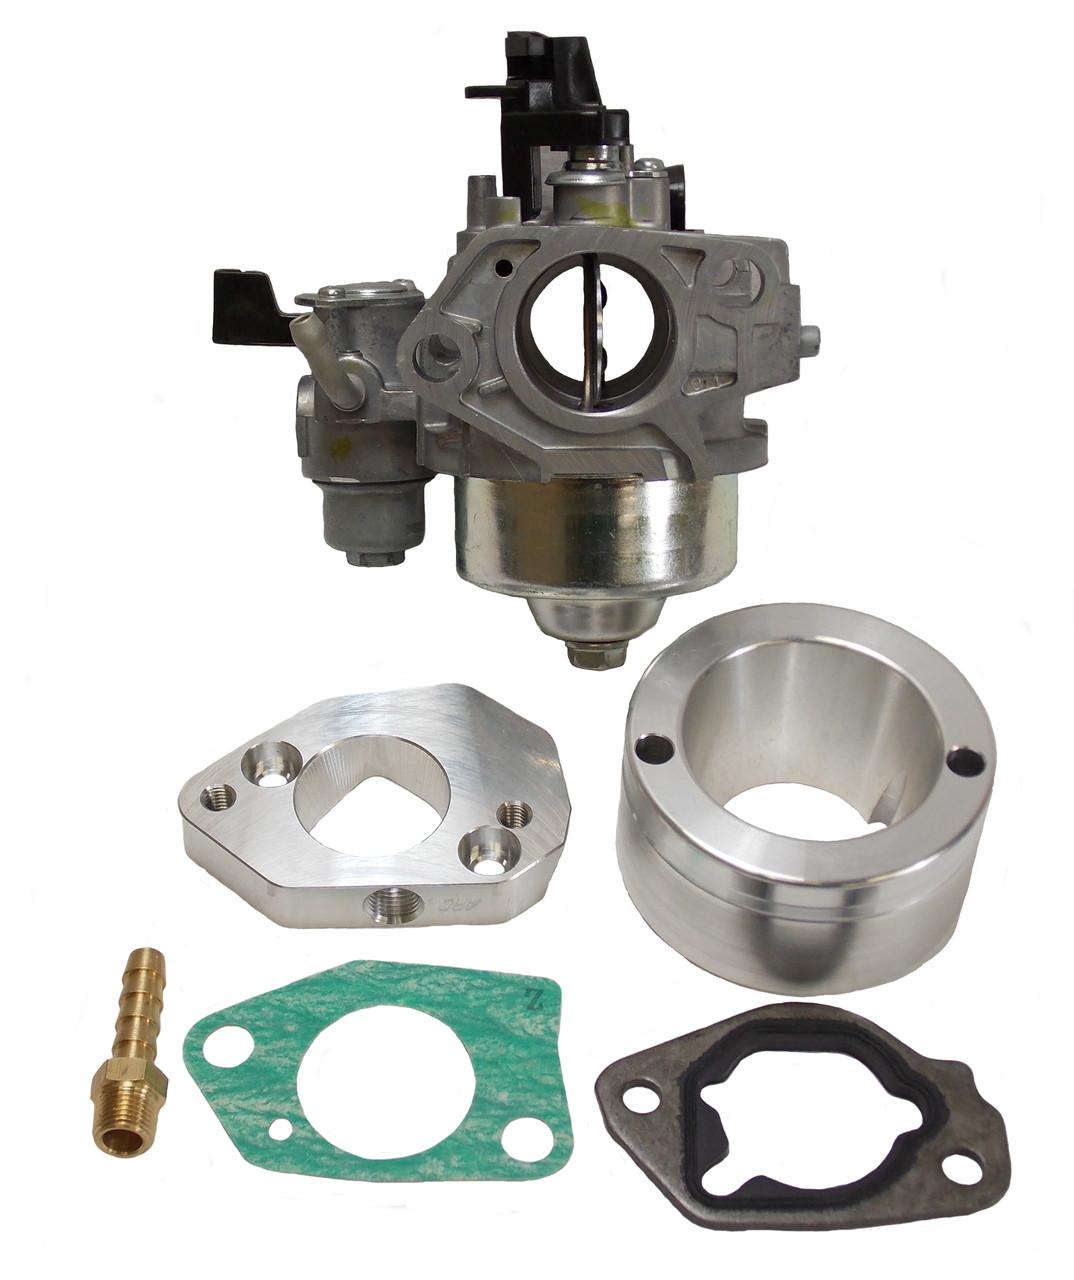 DJ-3225-KIT GX390 to GX200 .900 bore Methanol Carb Kit